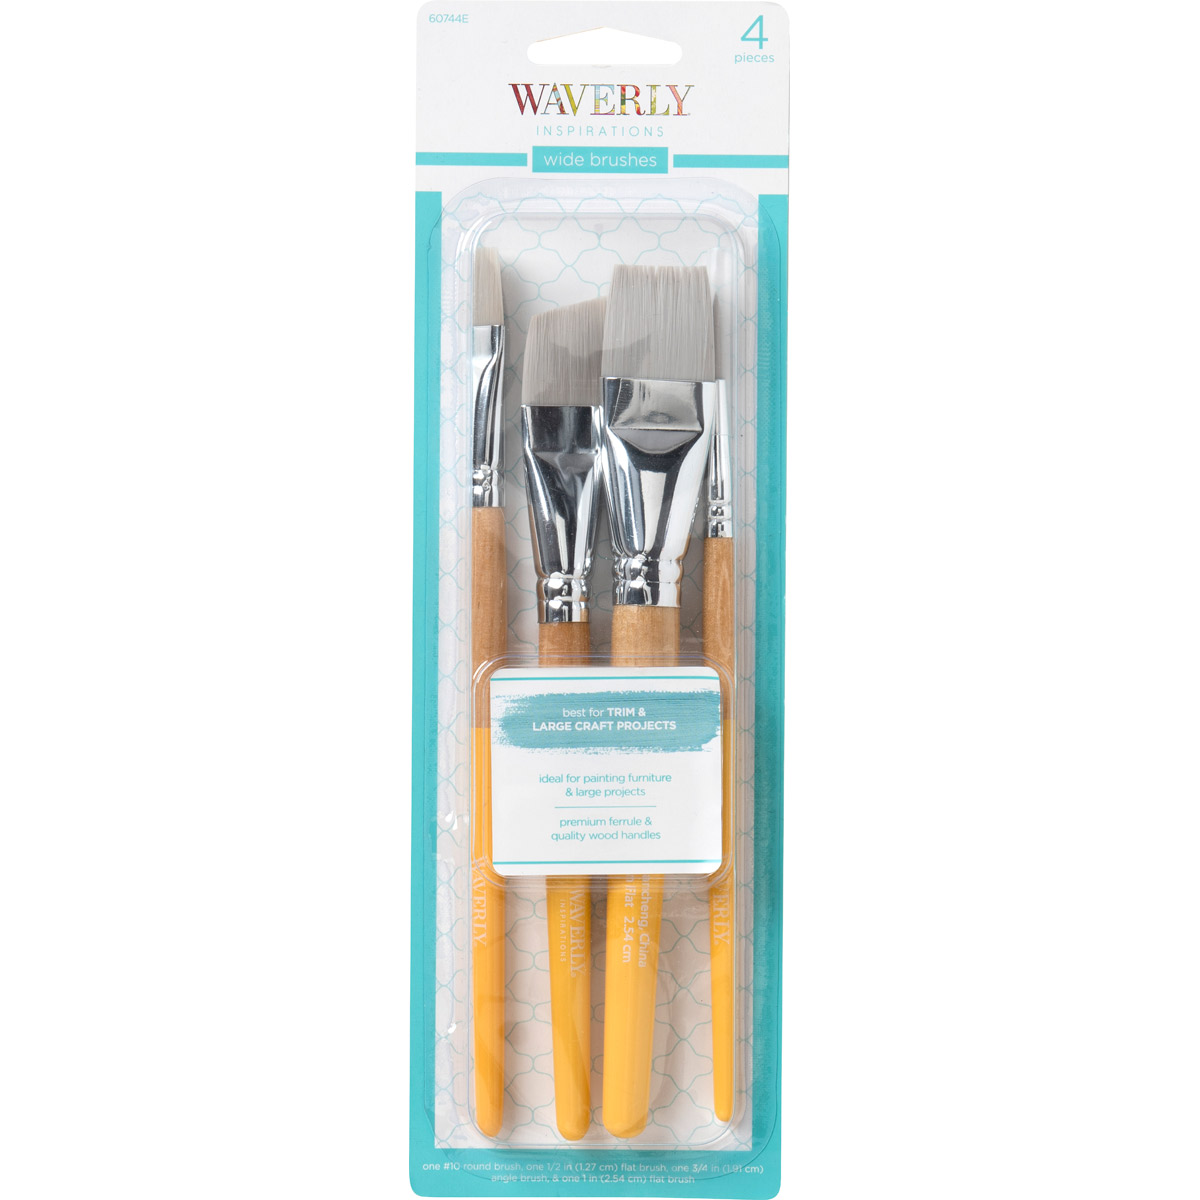 Waverly ® Inspirations Brushes - Wide Set, 4 pc. - 60744E